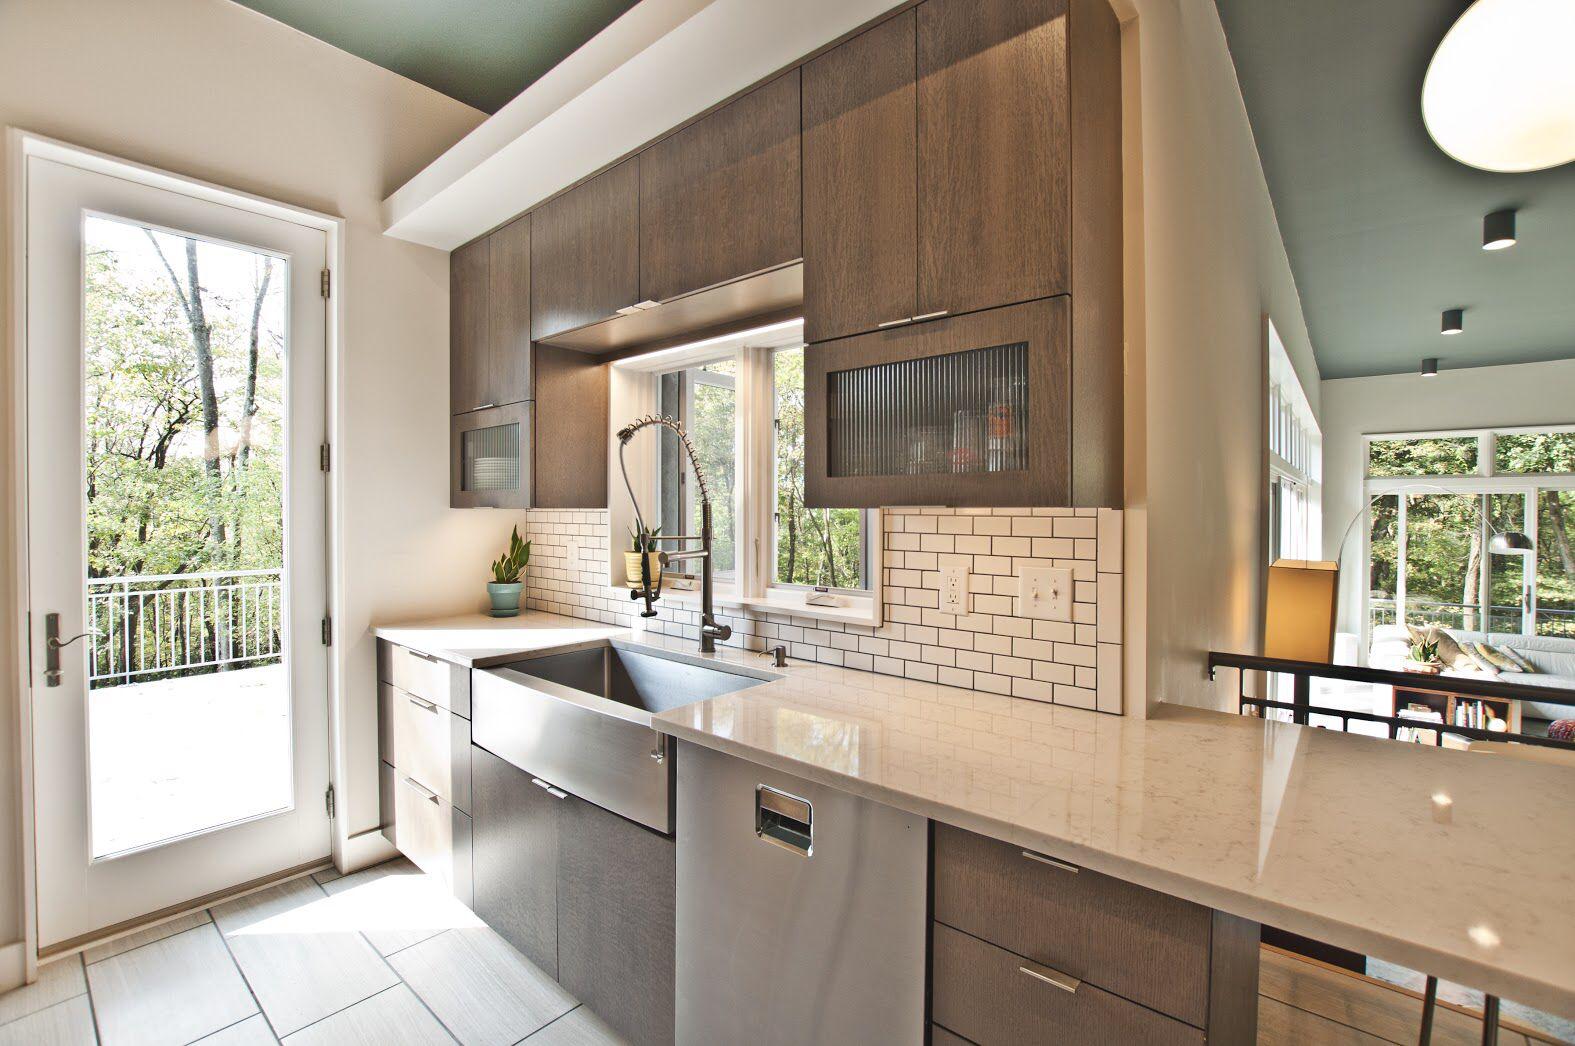 Designed by Terri Sears, Flat slab quarter sawn oak with a ...